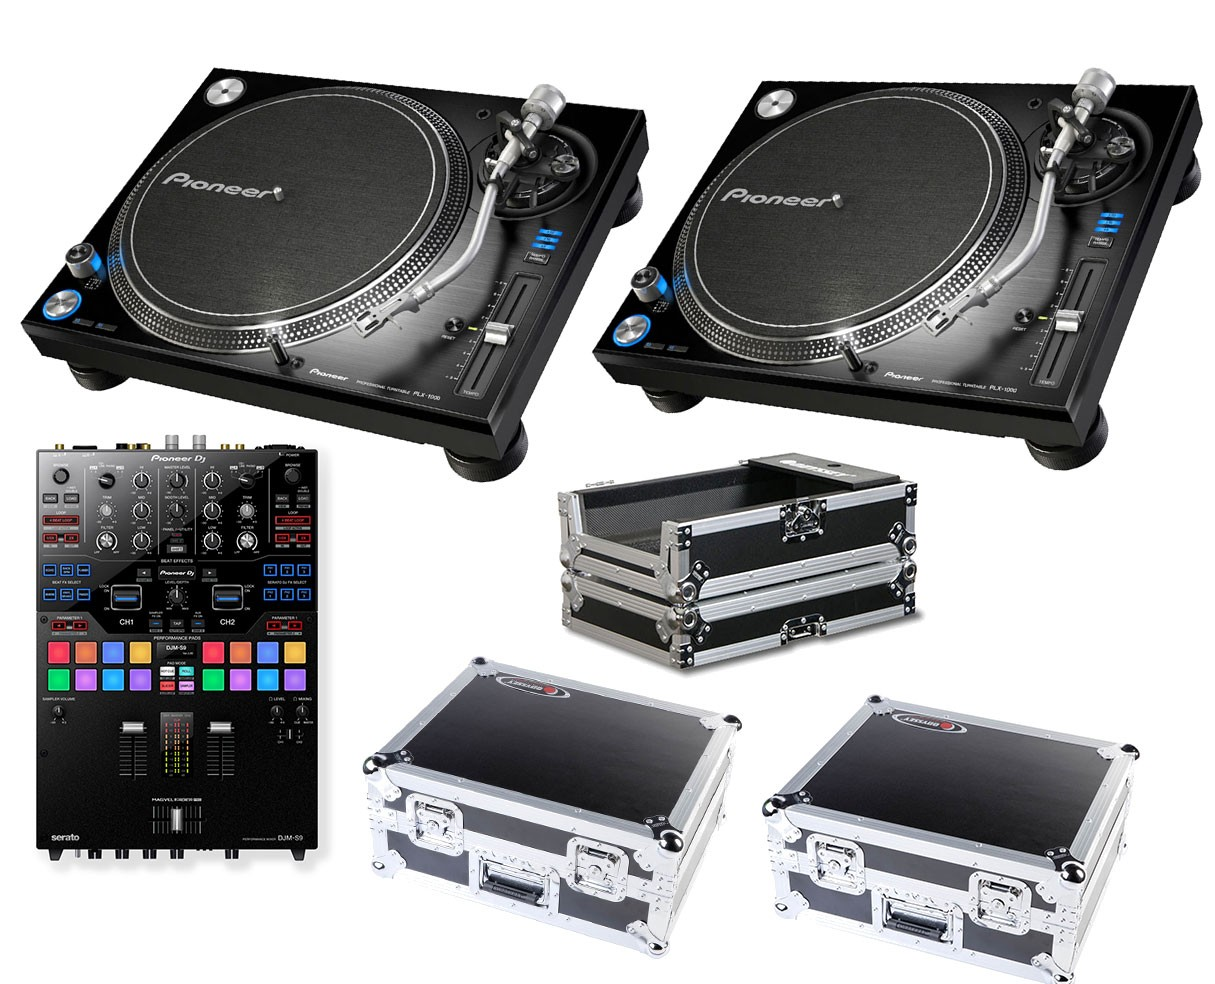 2x Pioneer PLX-1000 + DJM-S9 + Odyssey Cases